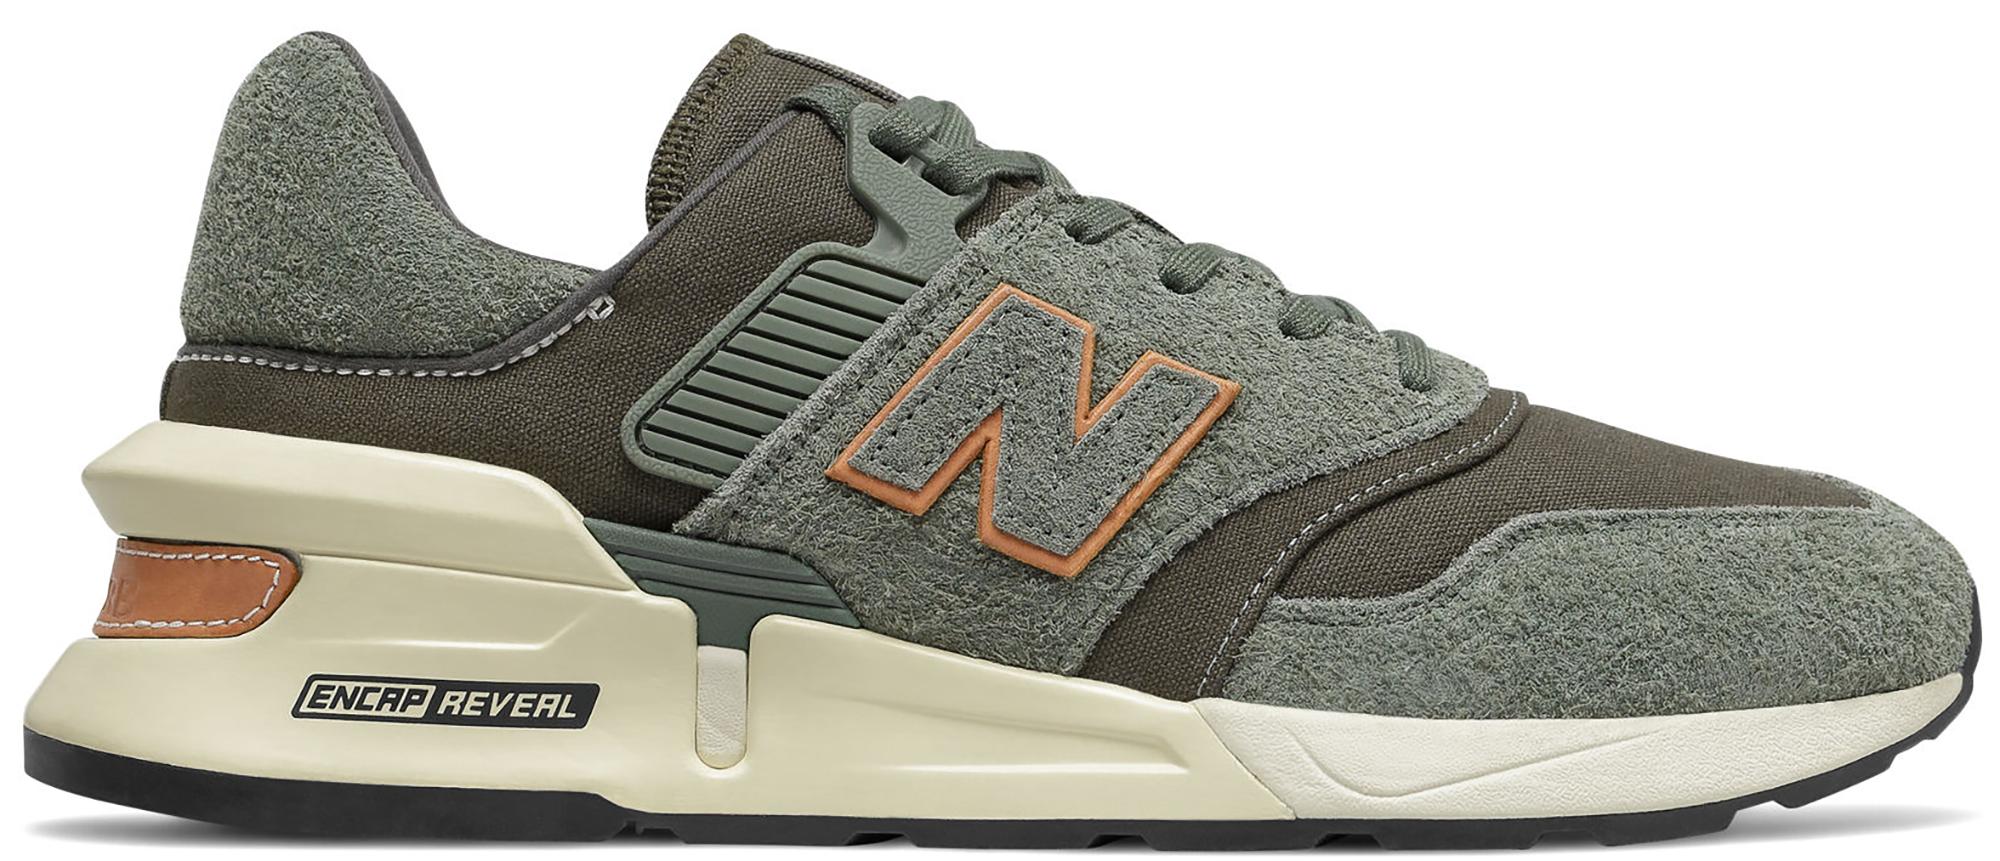 New Balance 997 Sport Slate Green Camo